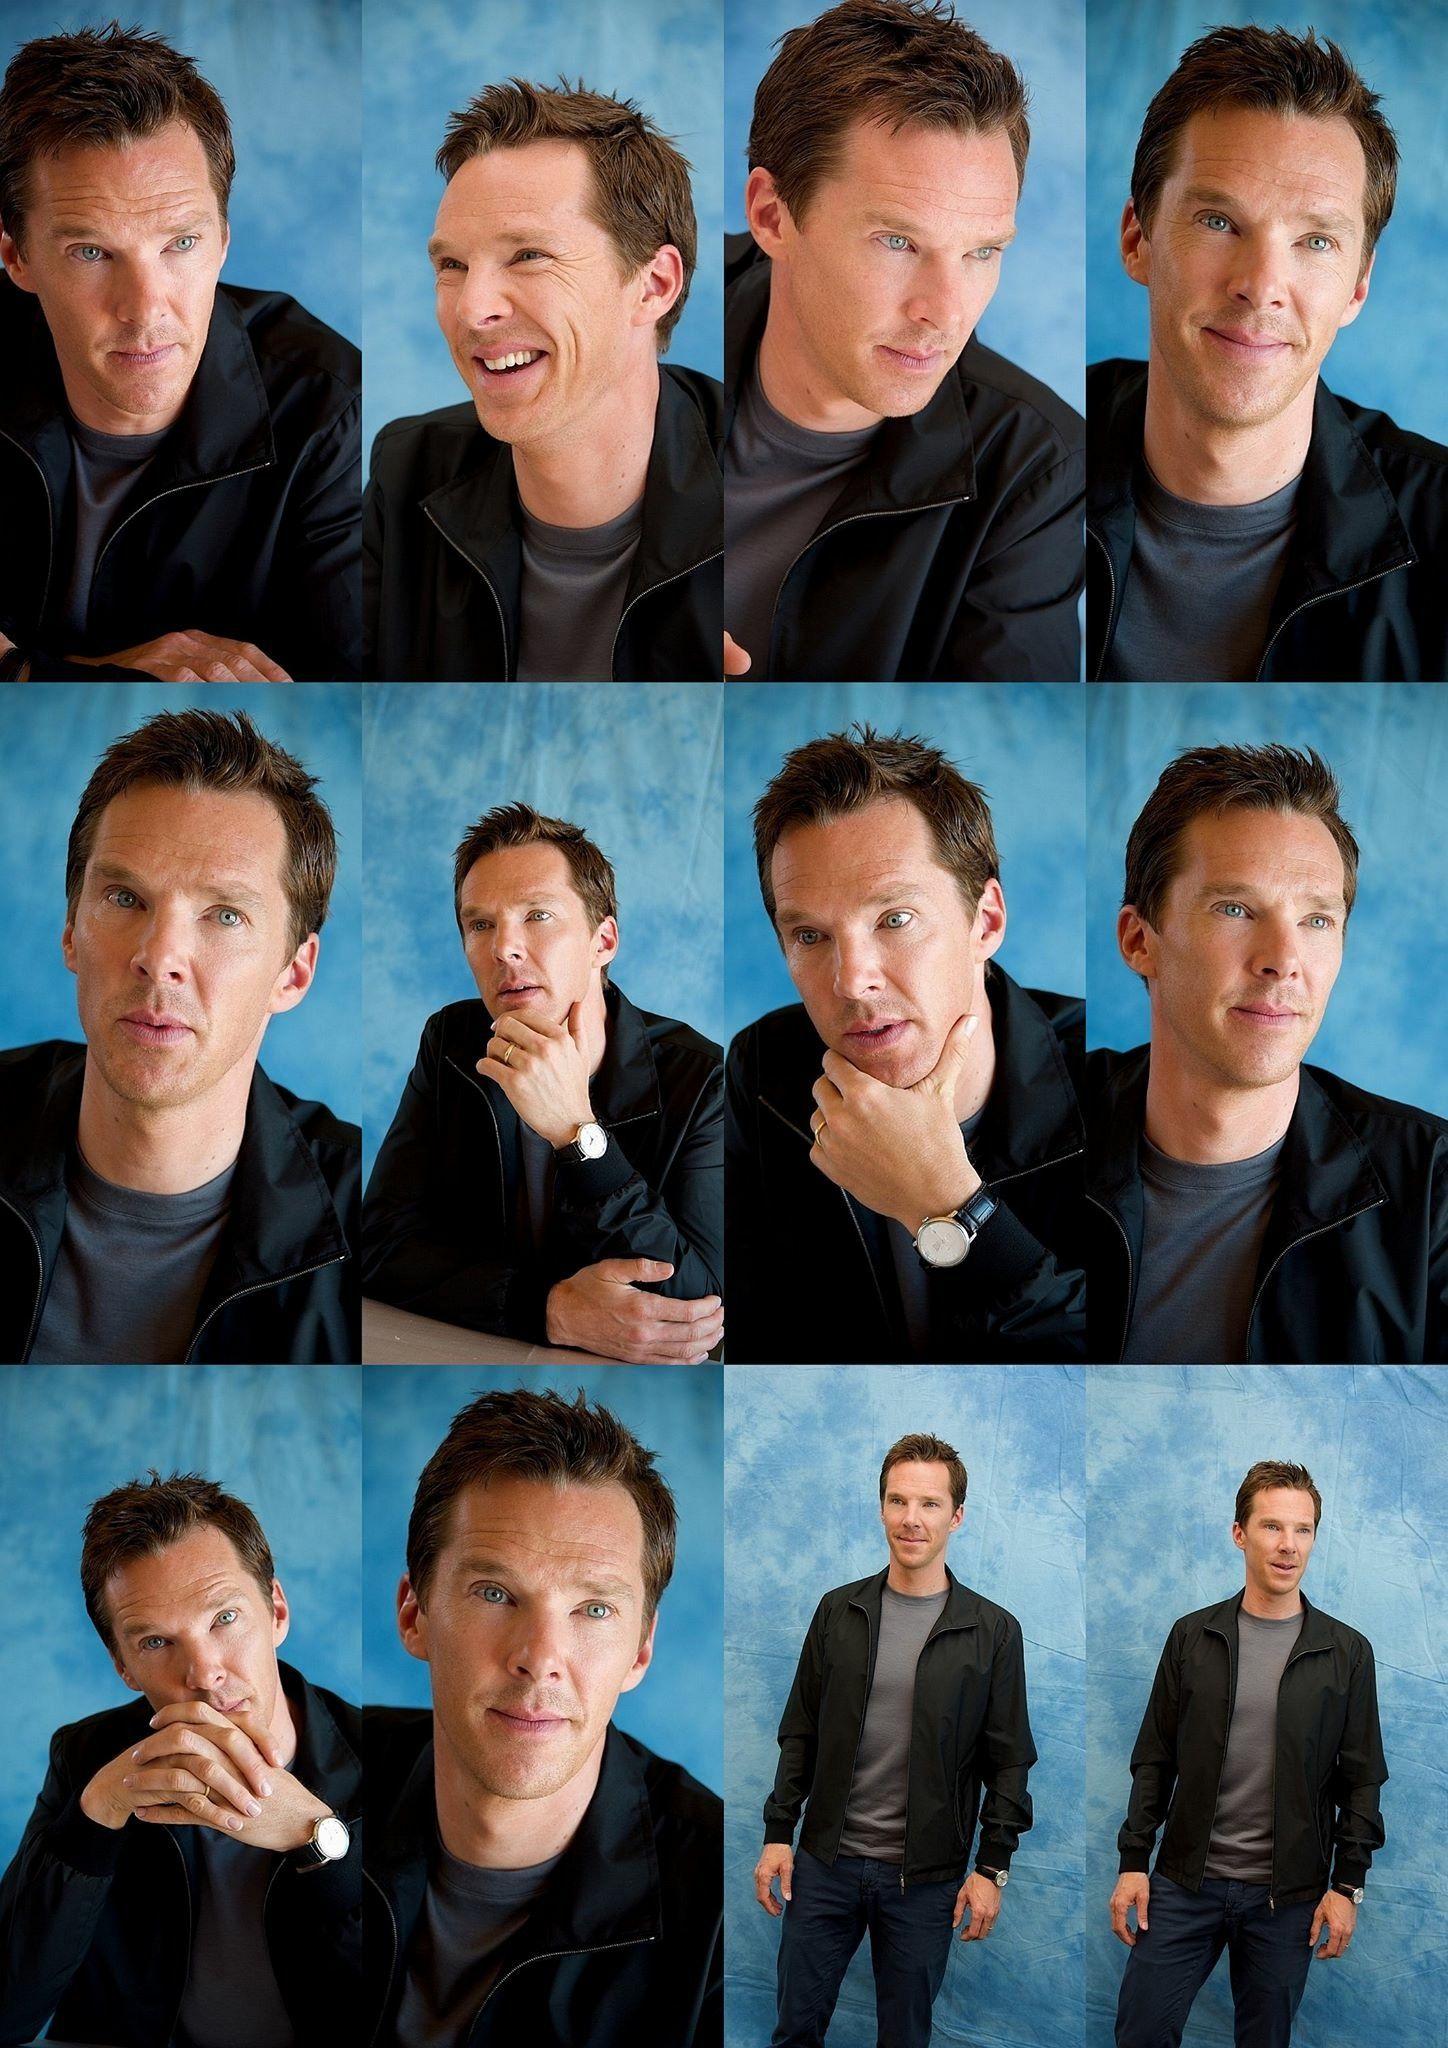 A collage of wonder.